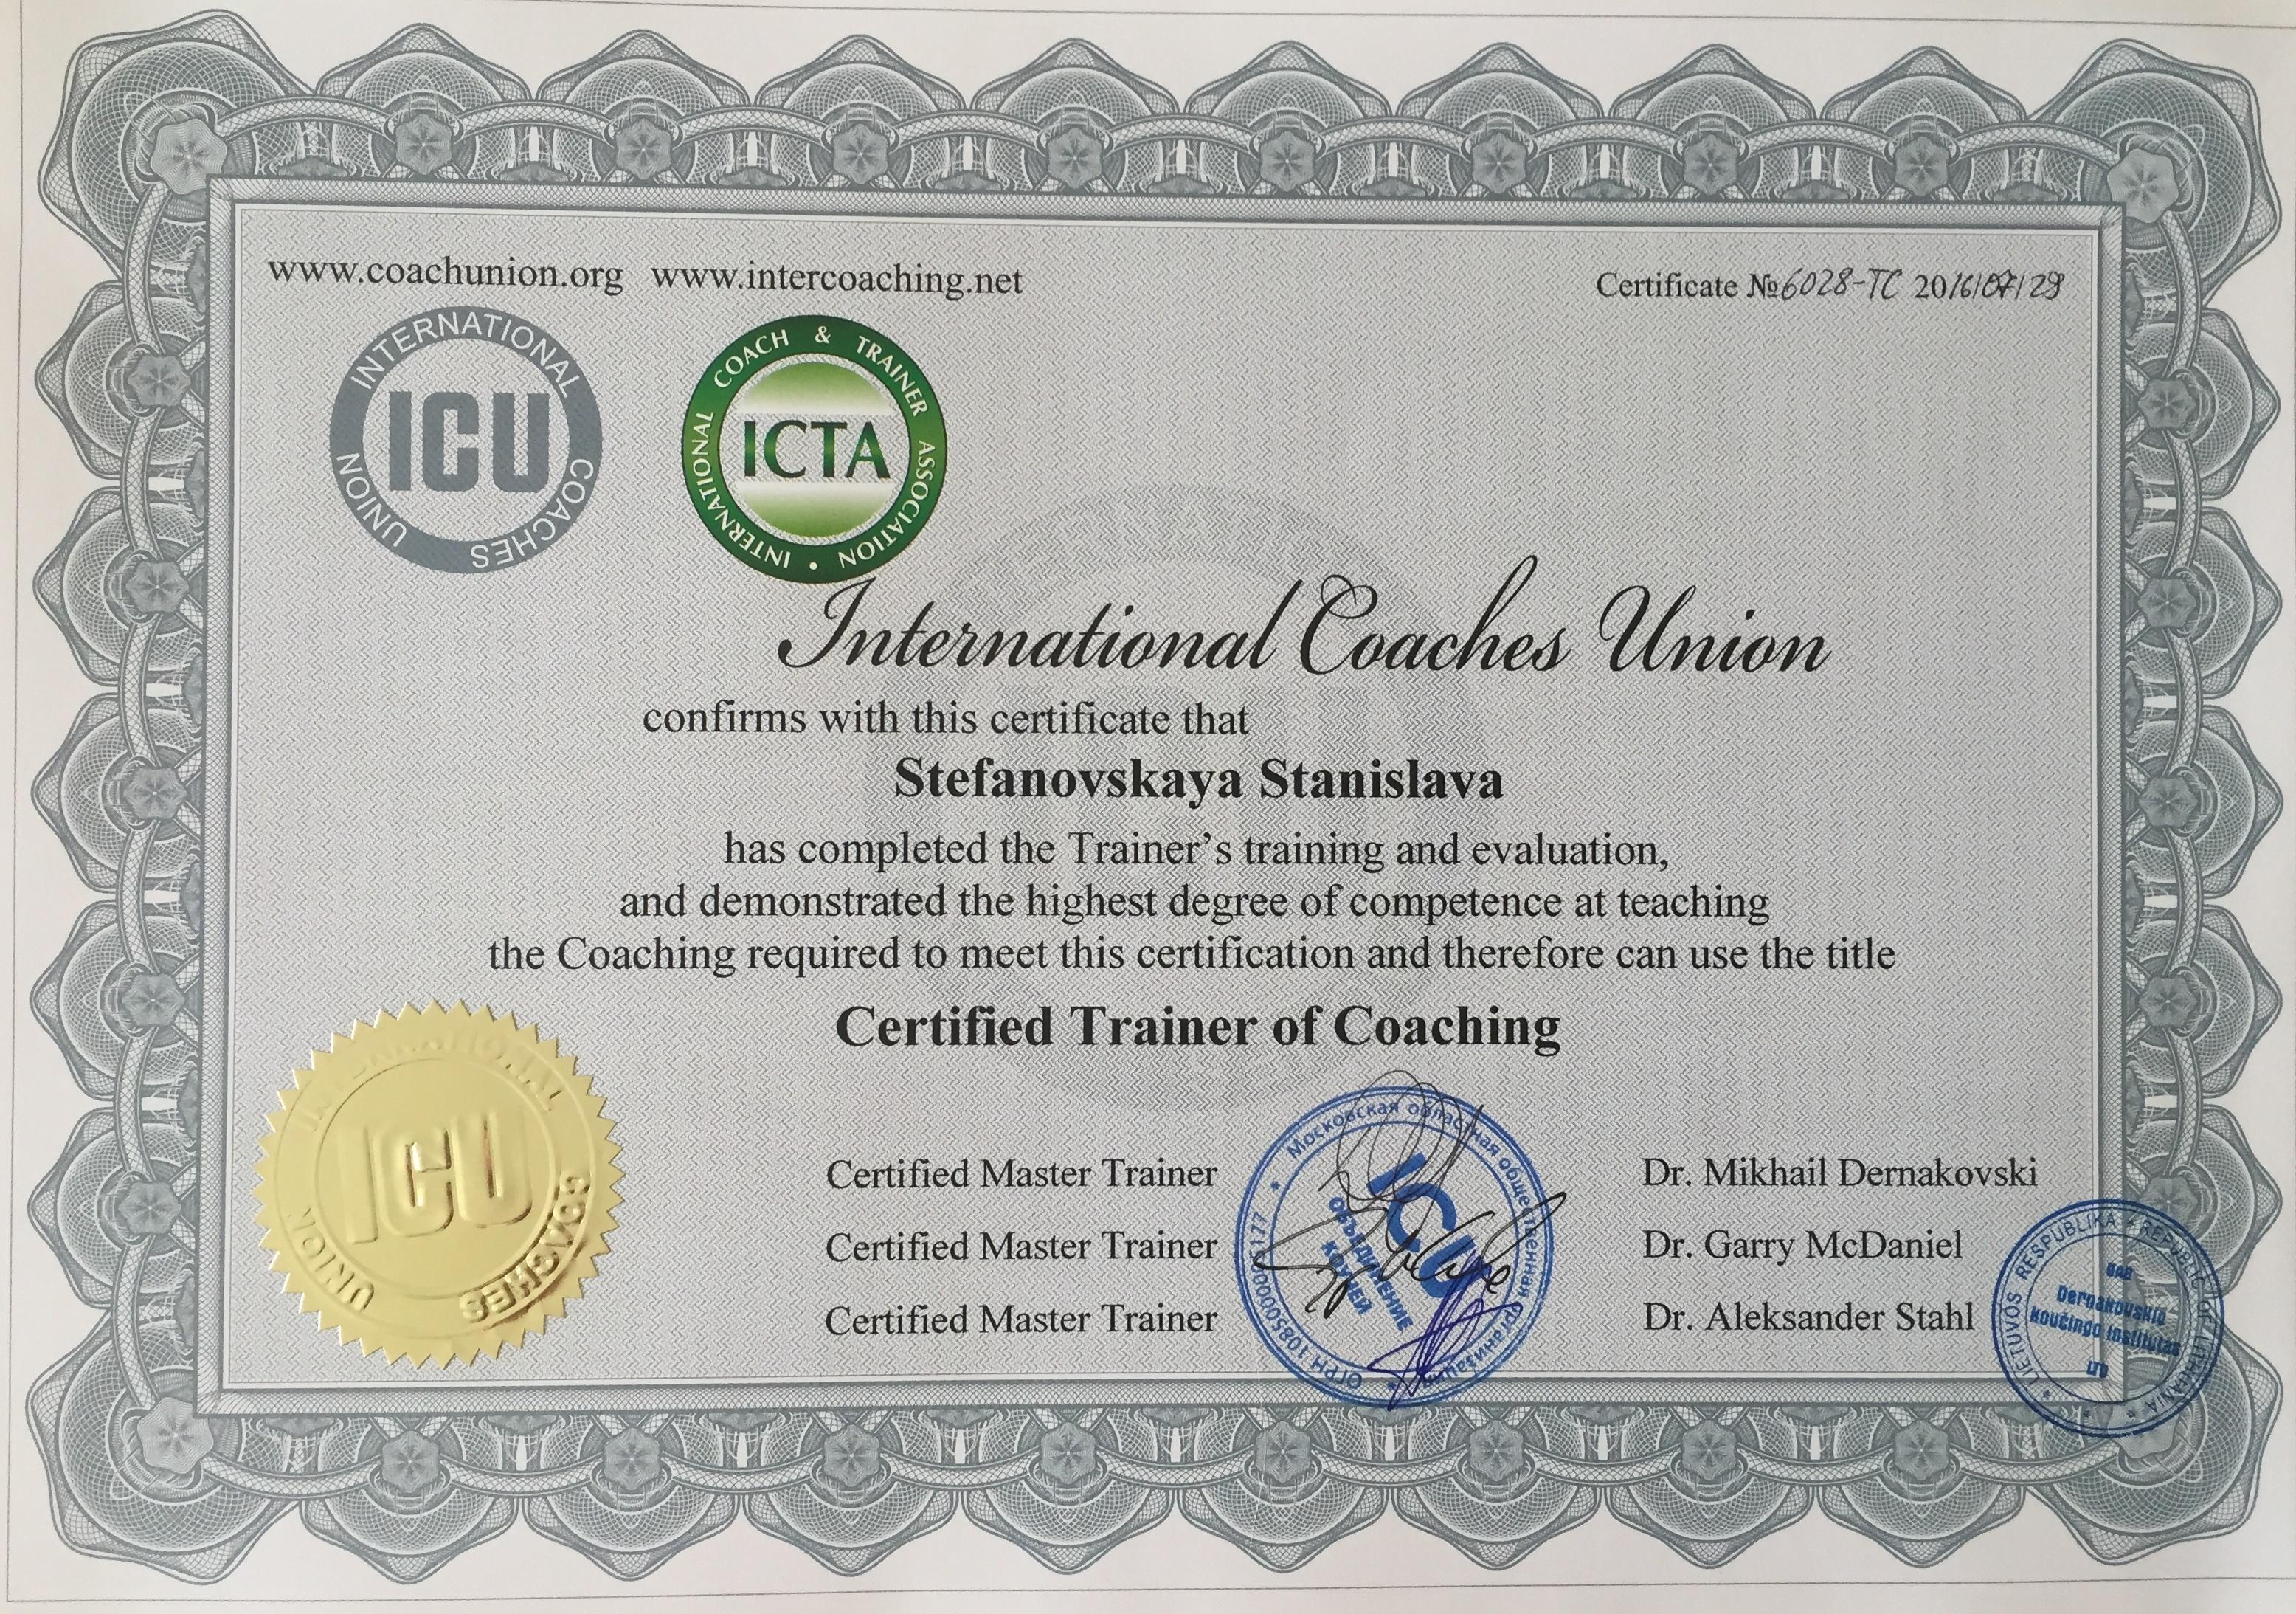 #Coach ICU #StanislavaStefanovskaya #BusinessTrainer